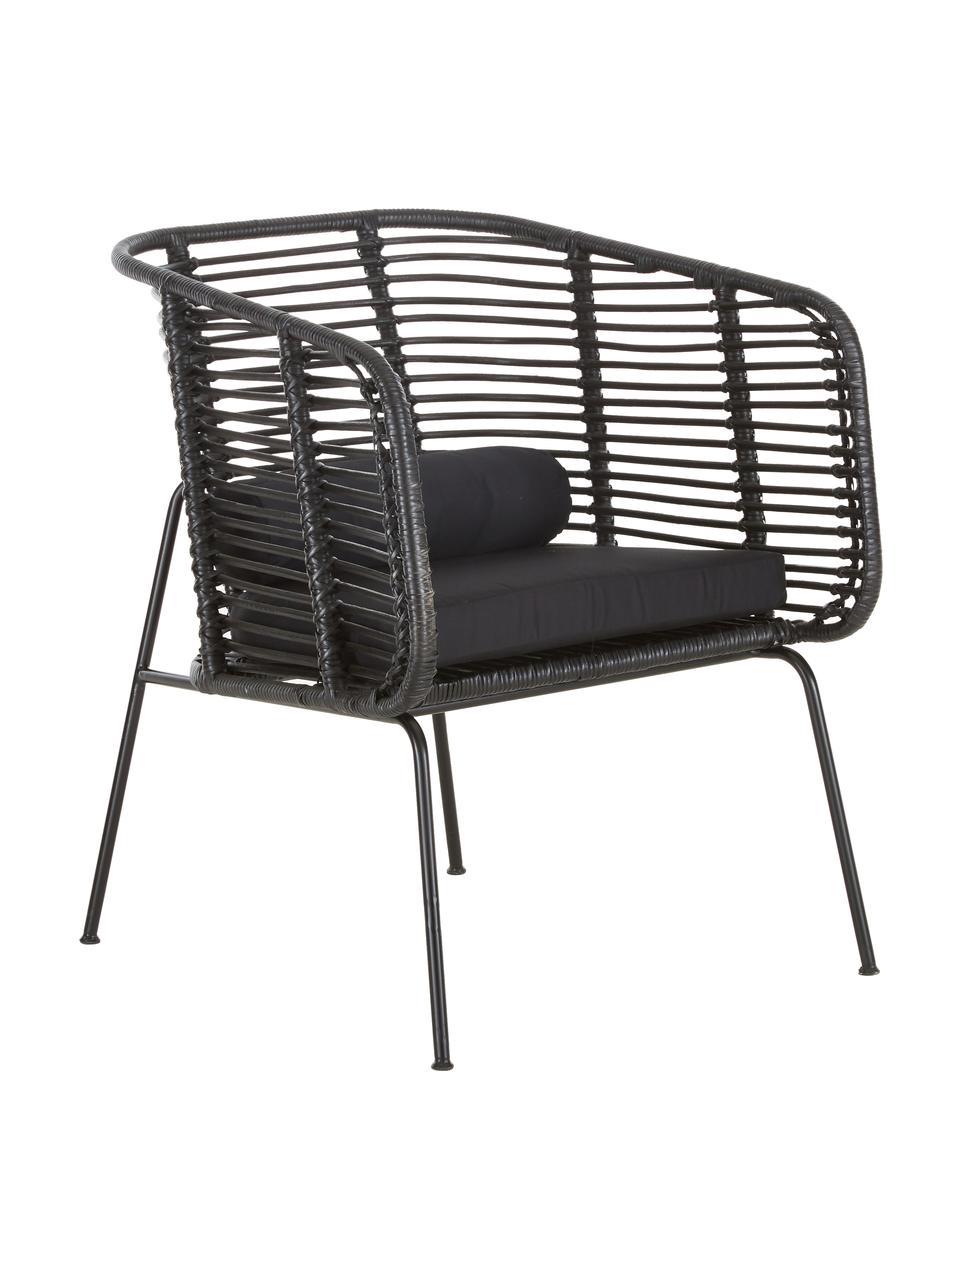 Rattan-Loungestuhl Merete, Sitzfläche: Rattan, Gestell: Metall, pulverbeschichtet, Sitzfläche: SchwarzGestell: Schwarz, mattKissenhüllen: Schwarz, B 72 x T 74 cm